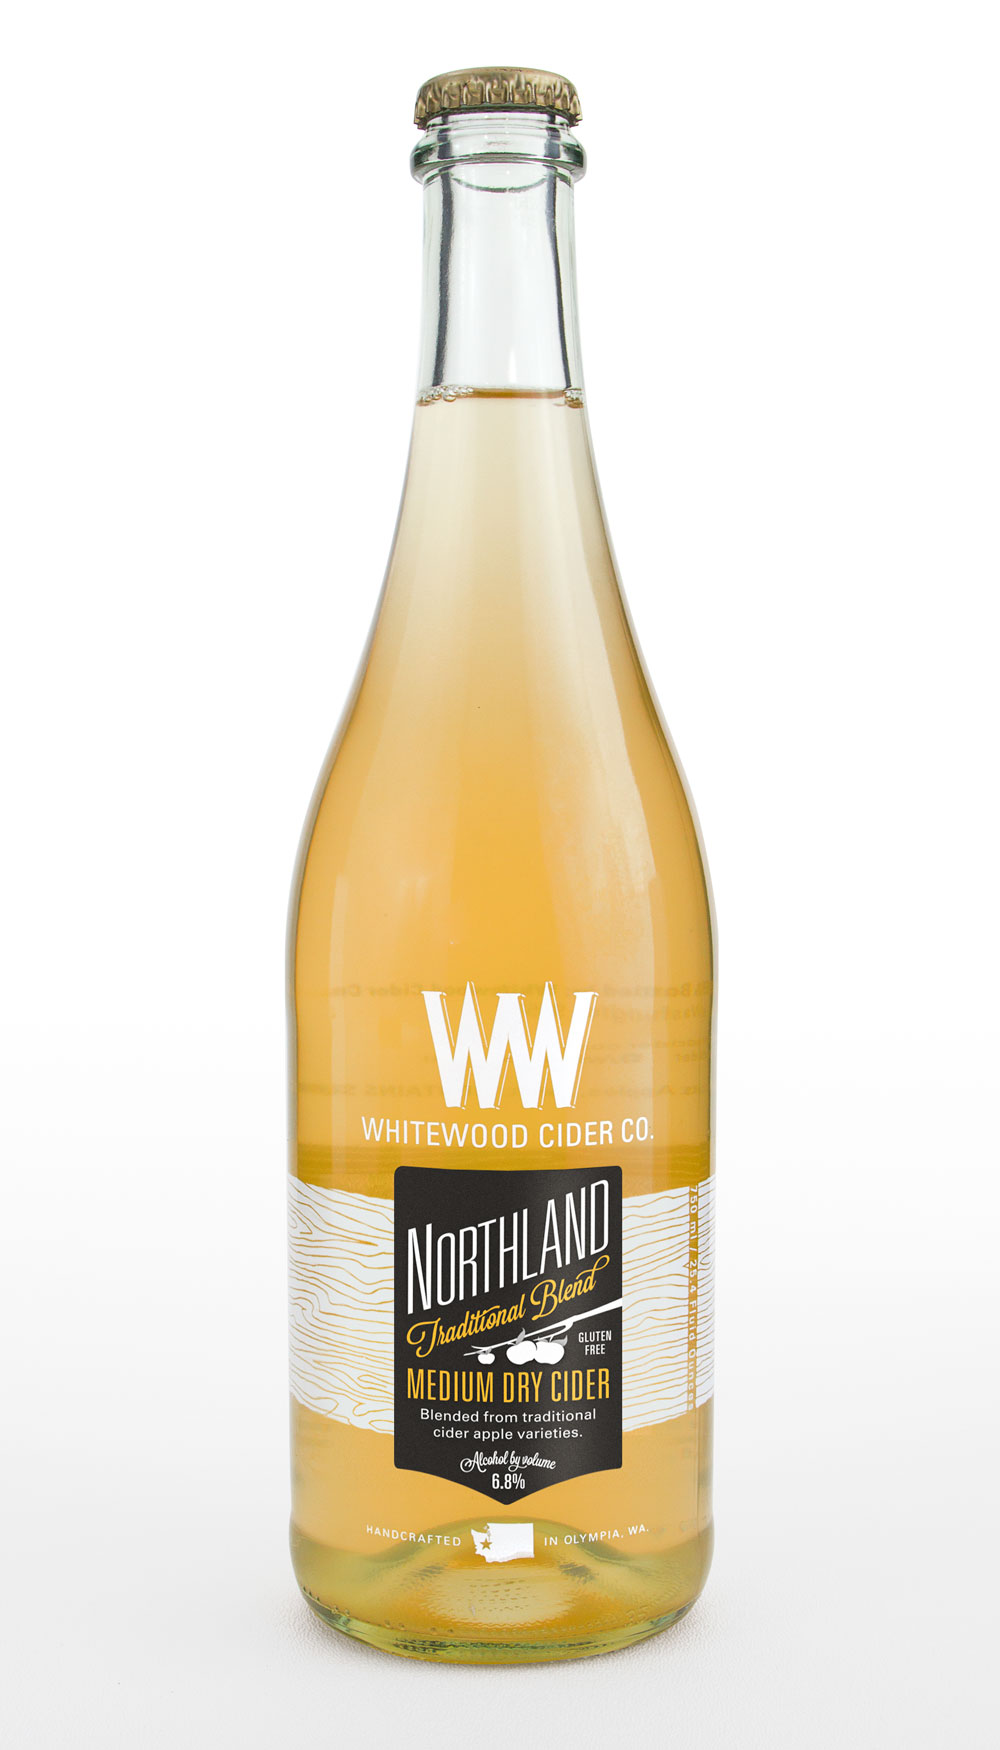 wwc_bottle_nl_01.jpg